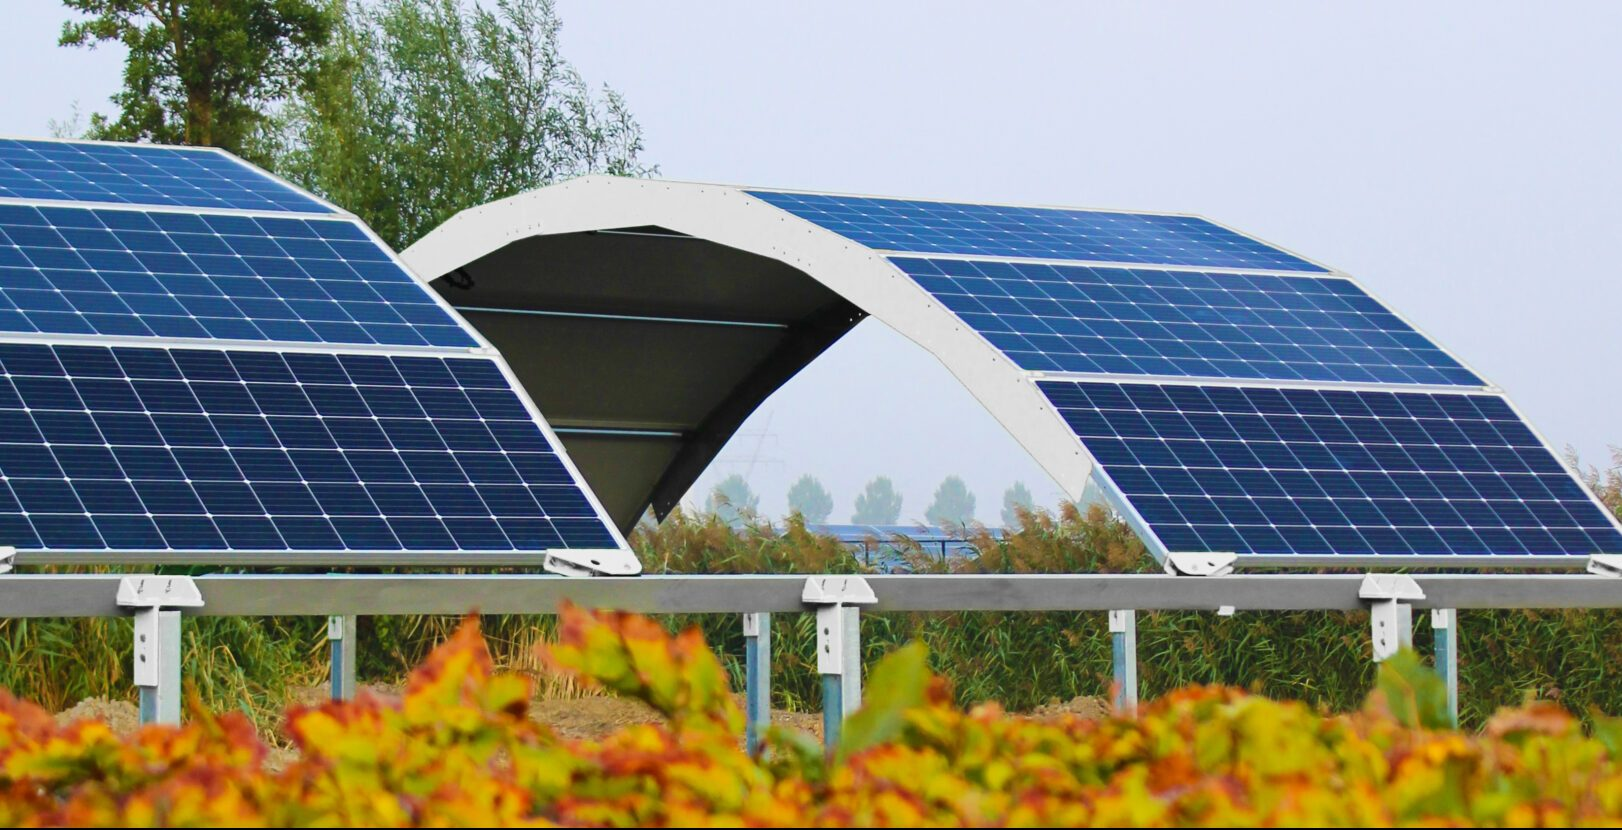 Tecnologie fotovoltaiche innovative